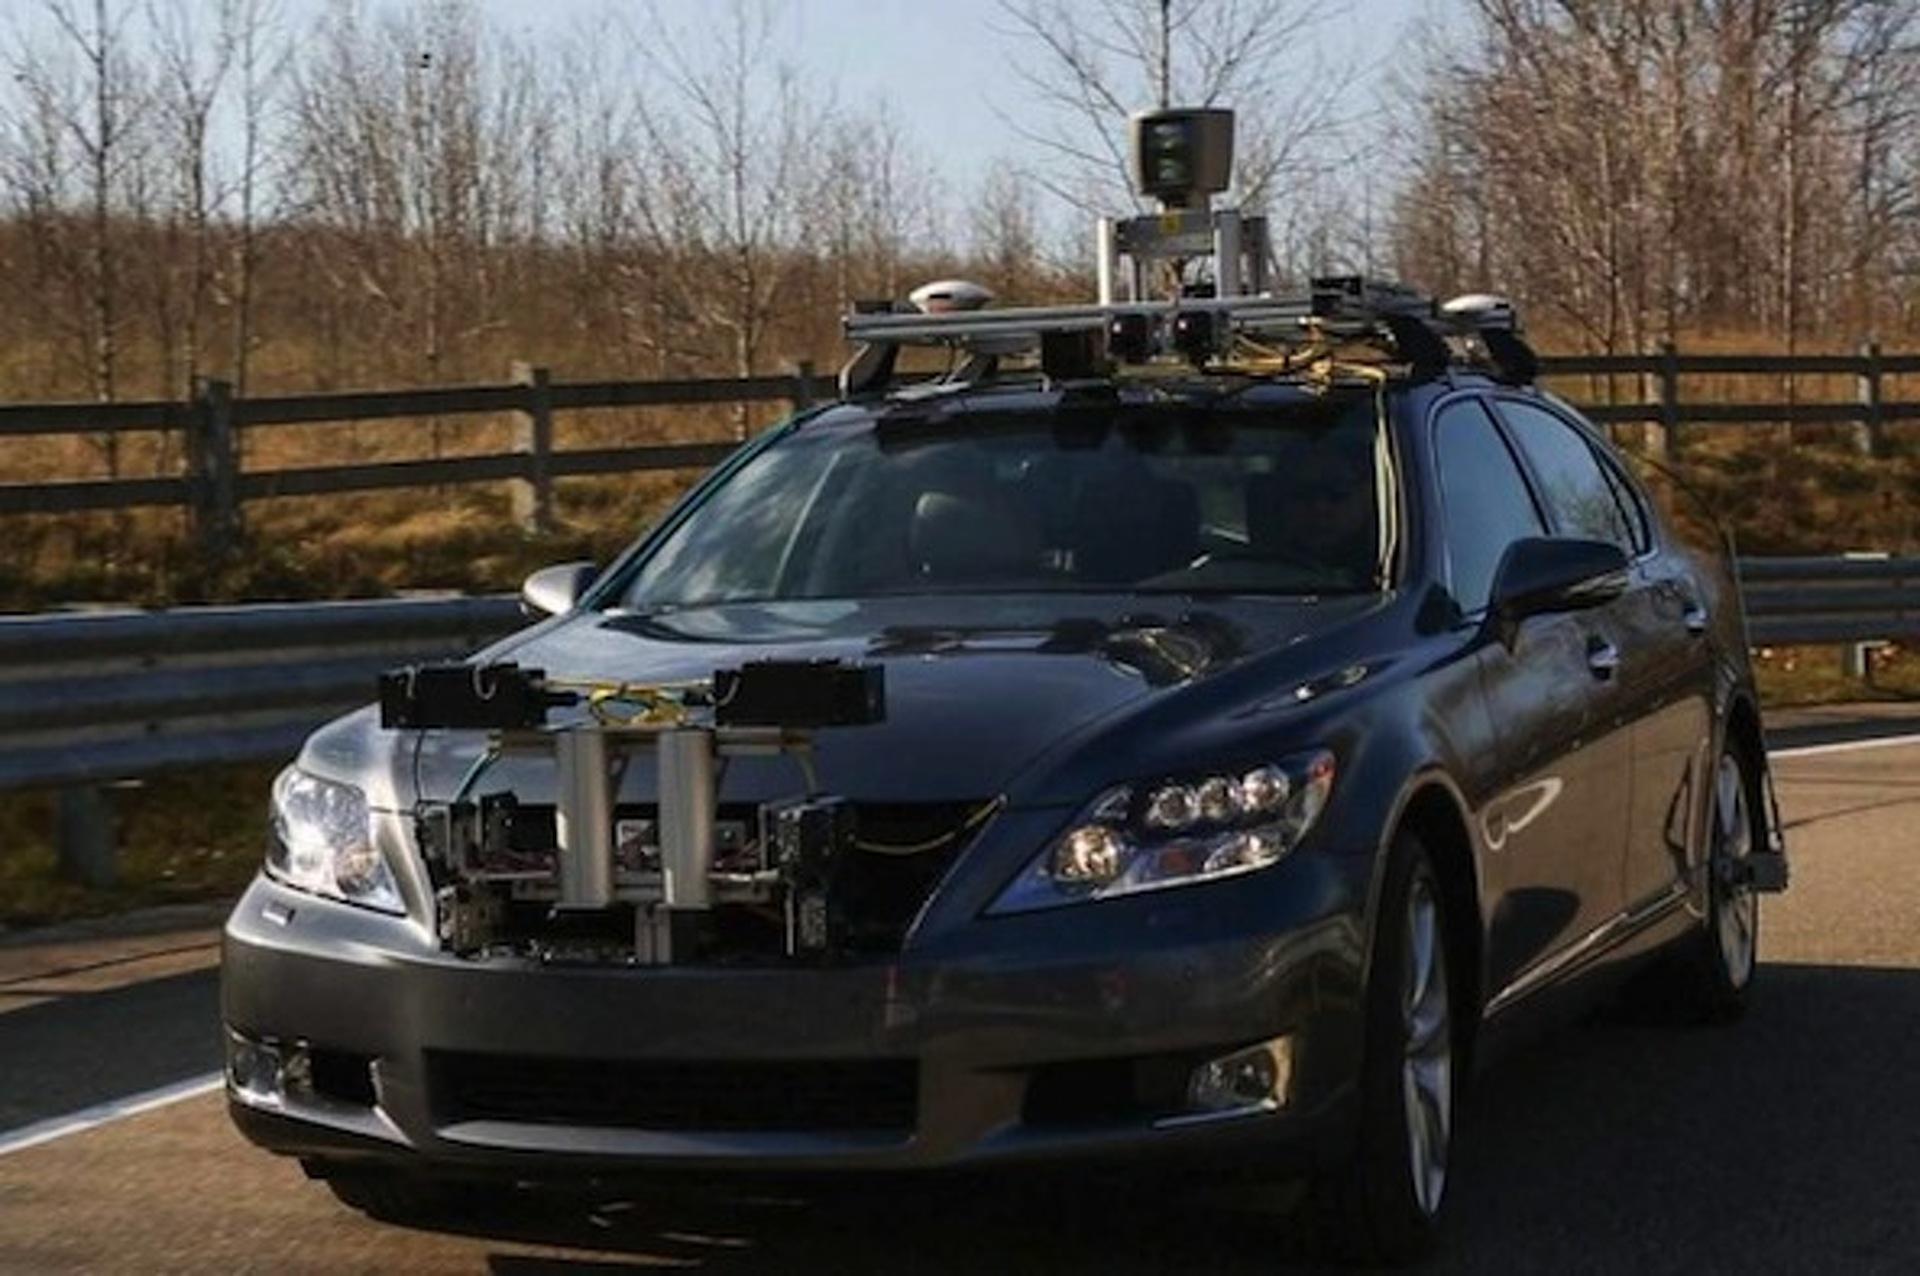 CES 2013: Toyota's Semi-Autonomous Vehicle Keeps The Driver in Control